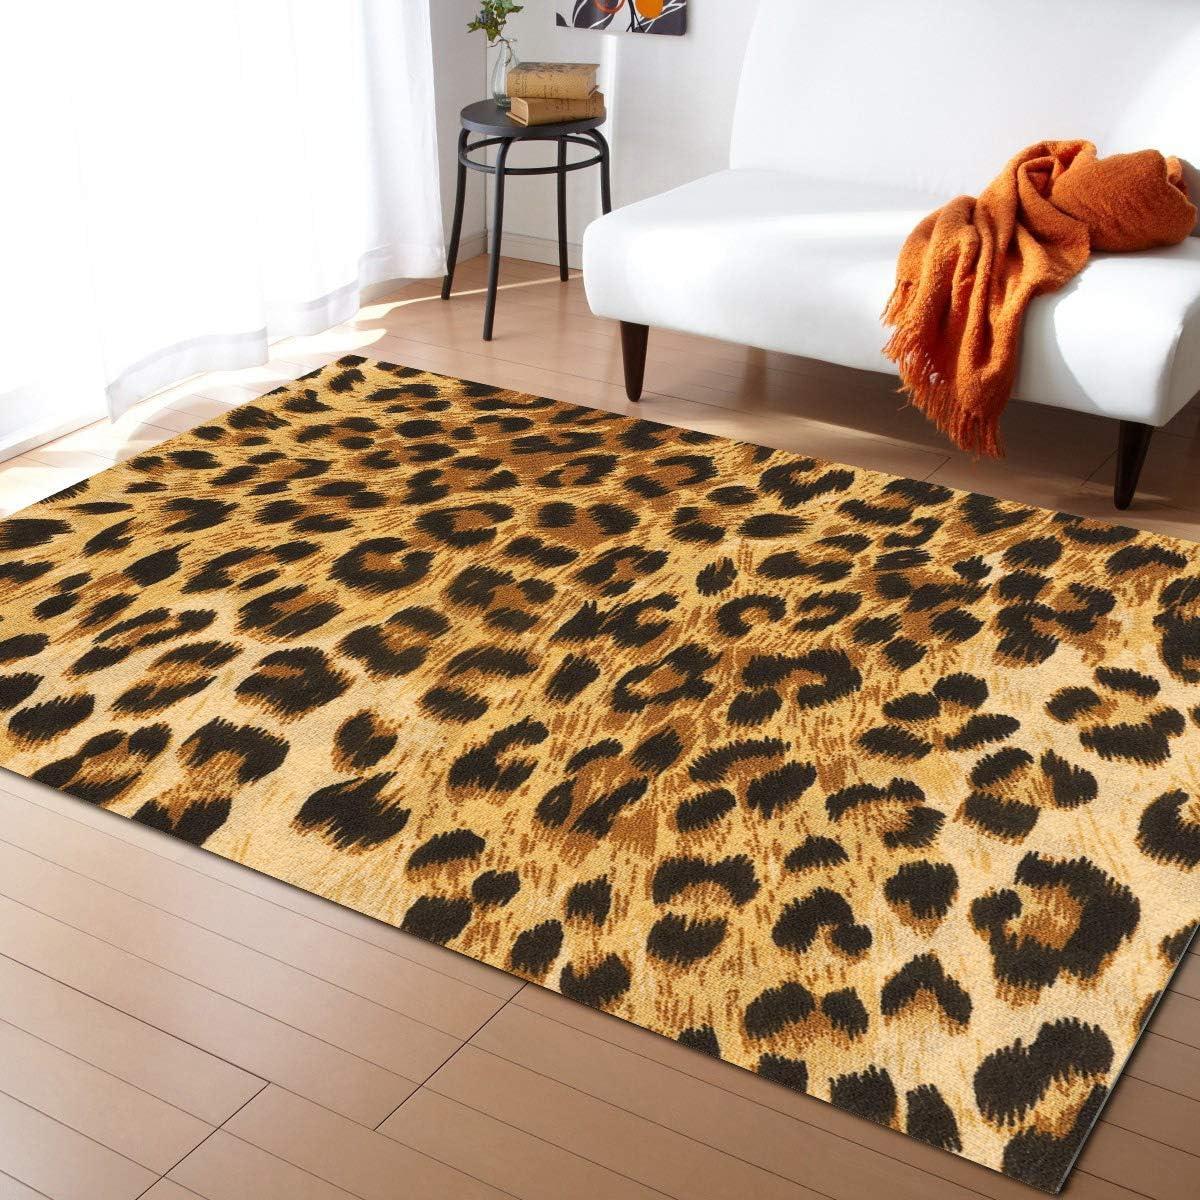 Olivefox 5x7 Feet Area Rug Floor Max 74% OFF Jacksonville Mall Carpet Indoor Floo Mat Leopard